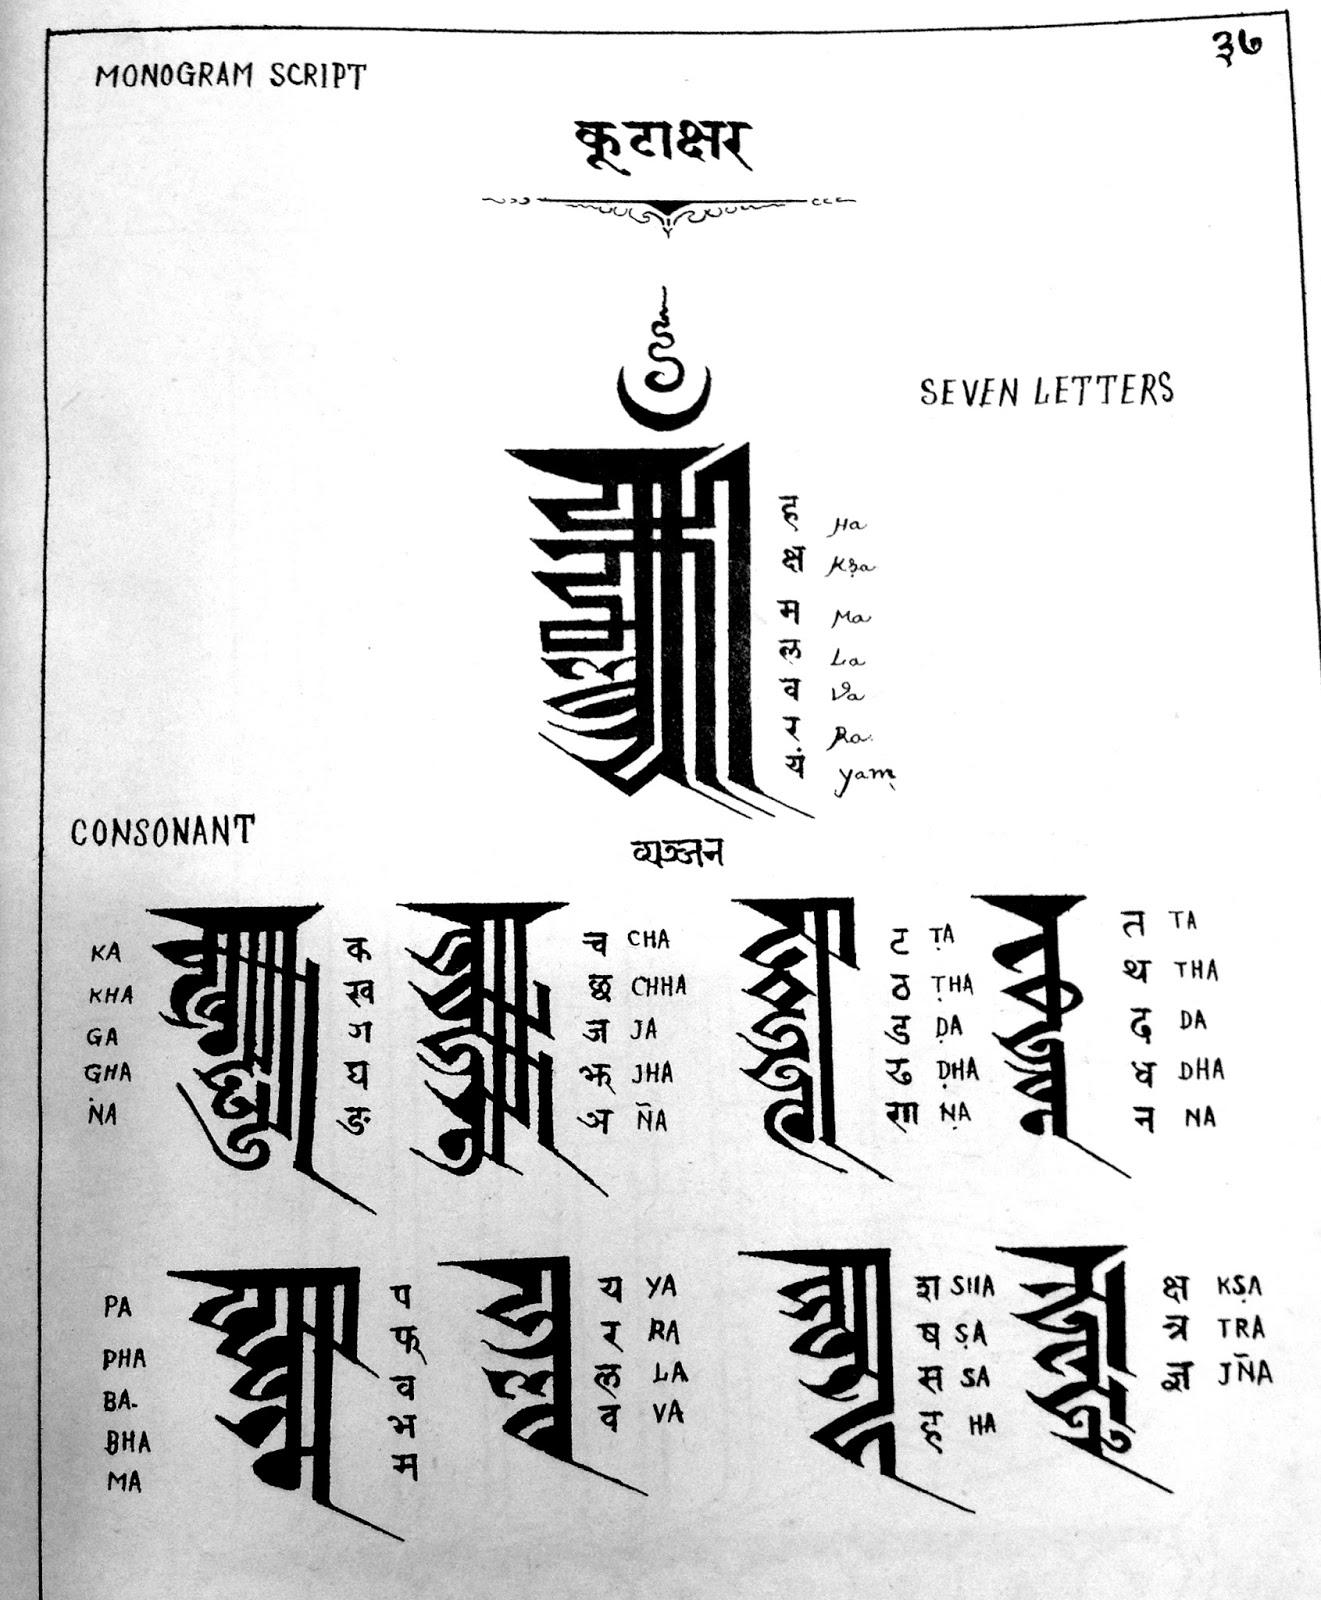 New nepali fonts kutakshar monogram script nepal kutakshar monogram script nepal bhasa newa lipi ranjana thecheapjerseys Choice Image